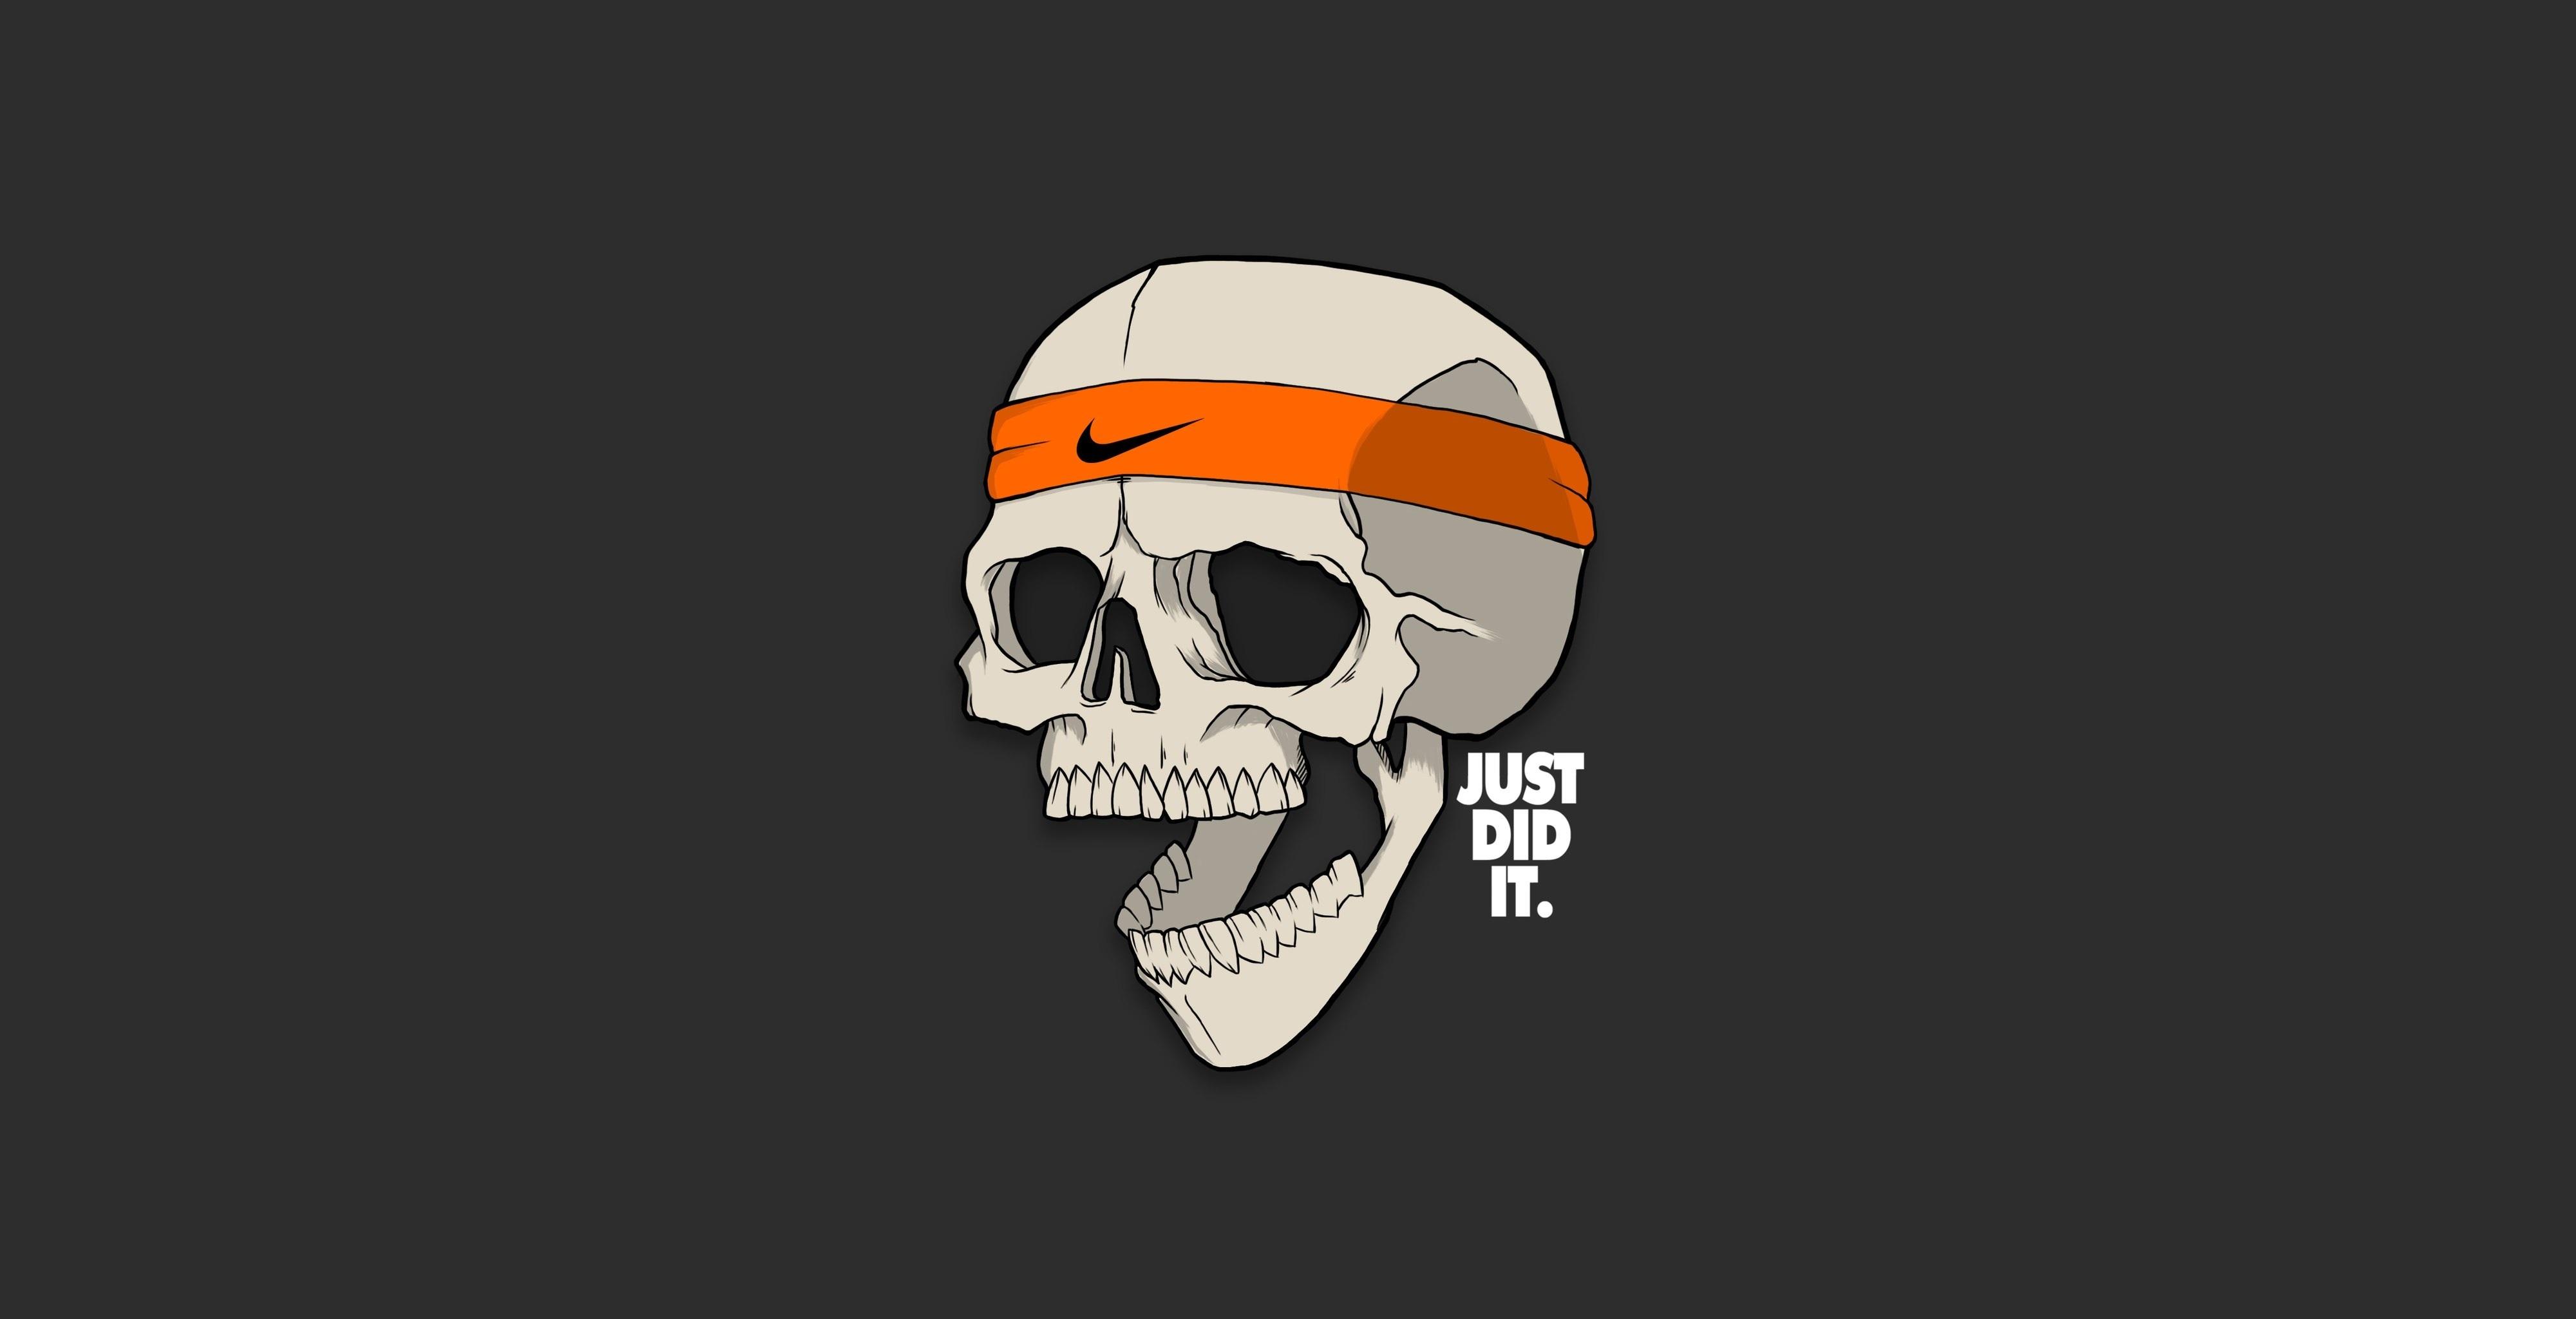 Fantastic Wallpaper Macbook Nike - skull-just-did-it-minimalism-6a  Image_591329.jpg